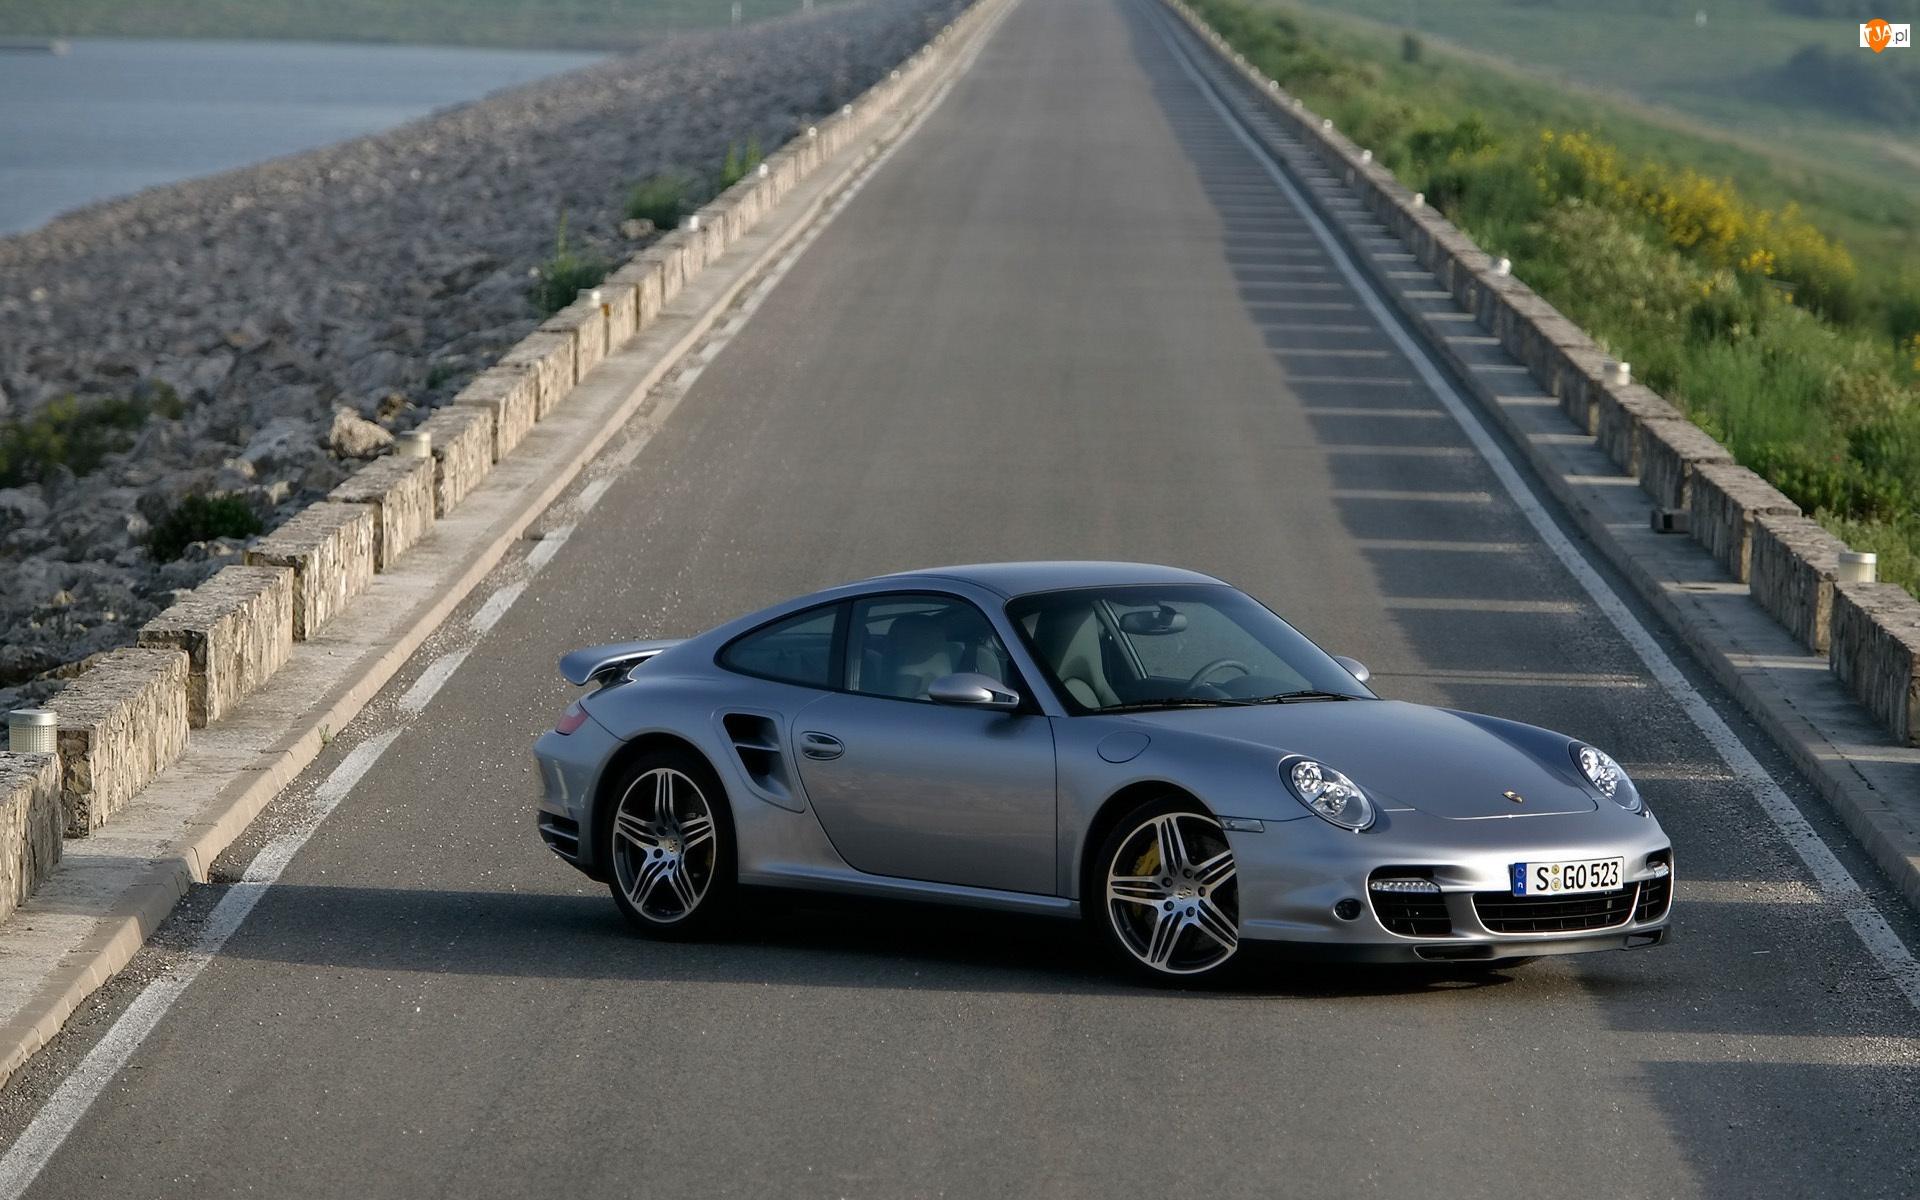 Droga, 911, Samochód, Srebrny,  , Porsche, Turbo